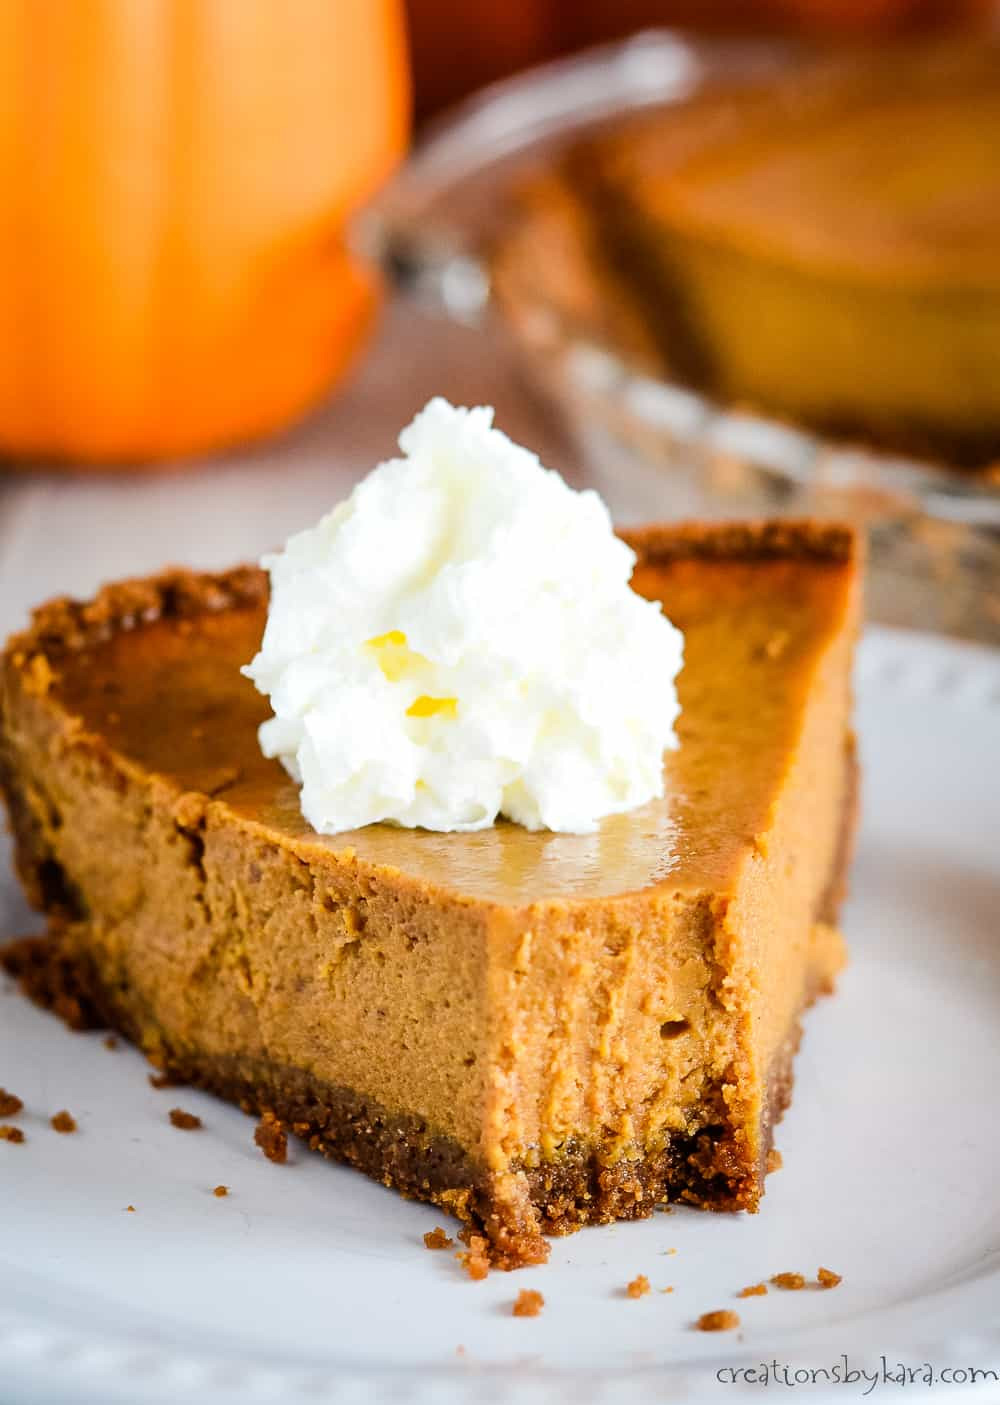 Pumpkin Pie Recipe With Sweetened Condensed Milk  Pumpkin Pie with Sweetened Condensed Milk Creations by Kara